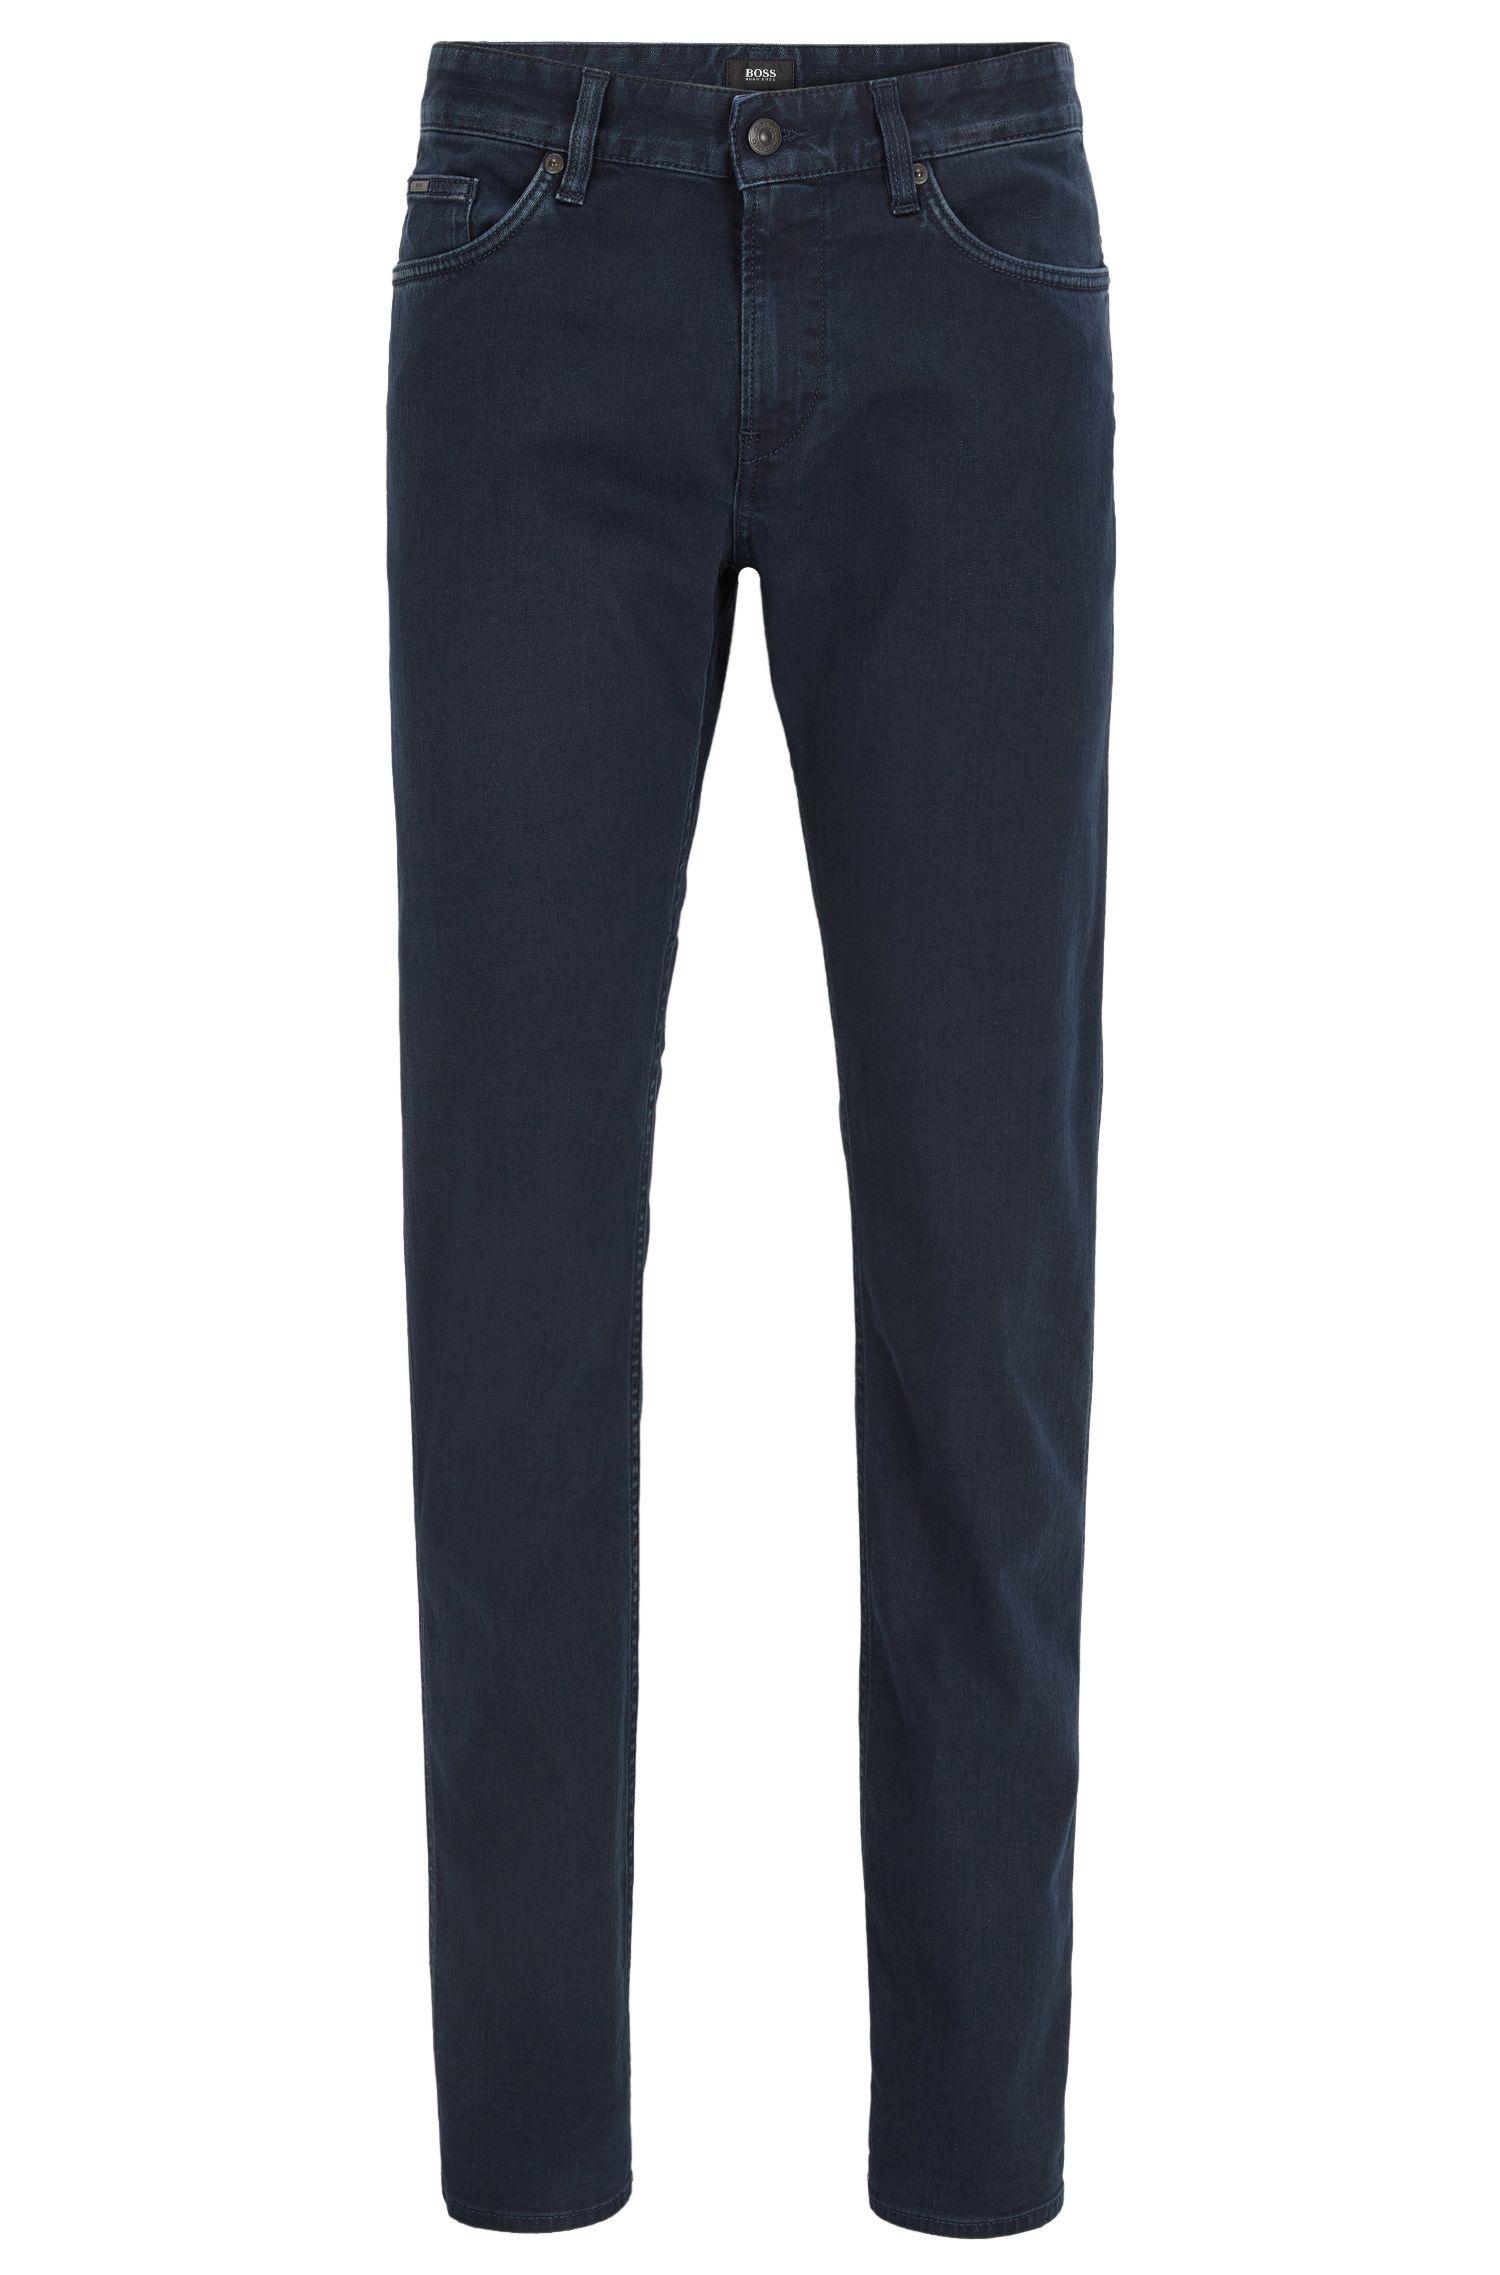 'Delaware' | Slim Fit, 9.5 oz Stretch Cotton Jeans